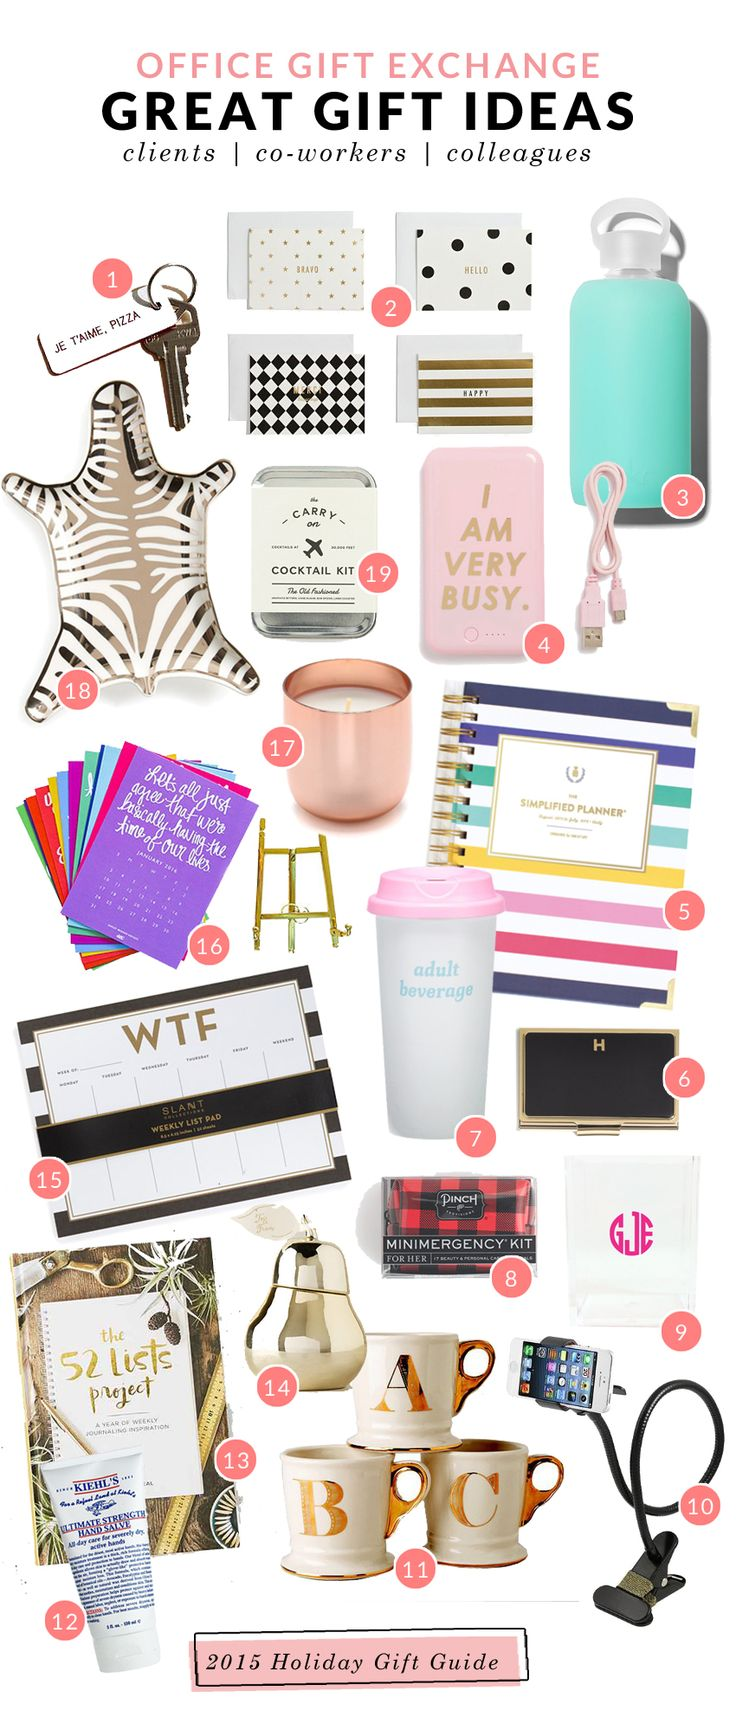 Great Secret Santa Gift Ideas: an ABD Desk Calendar! | #ispyABD